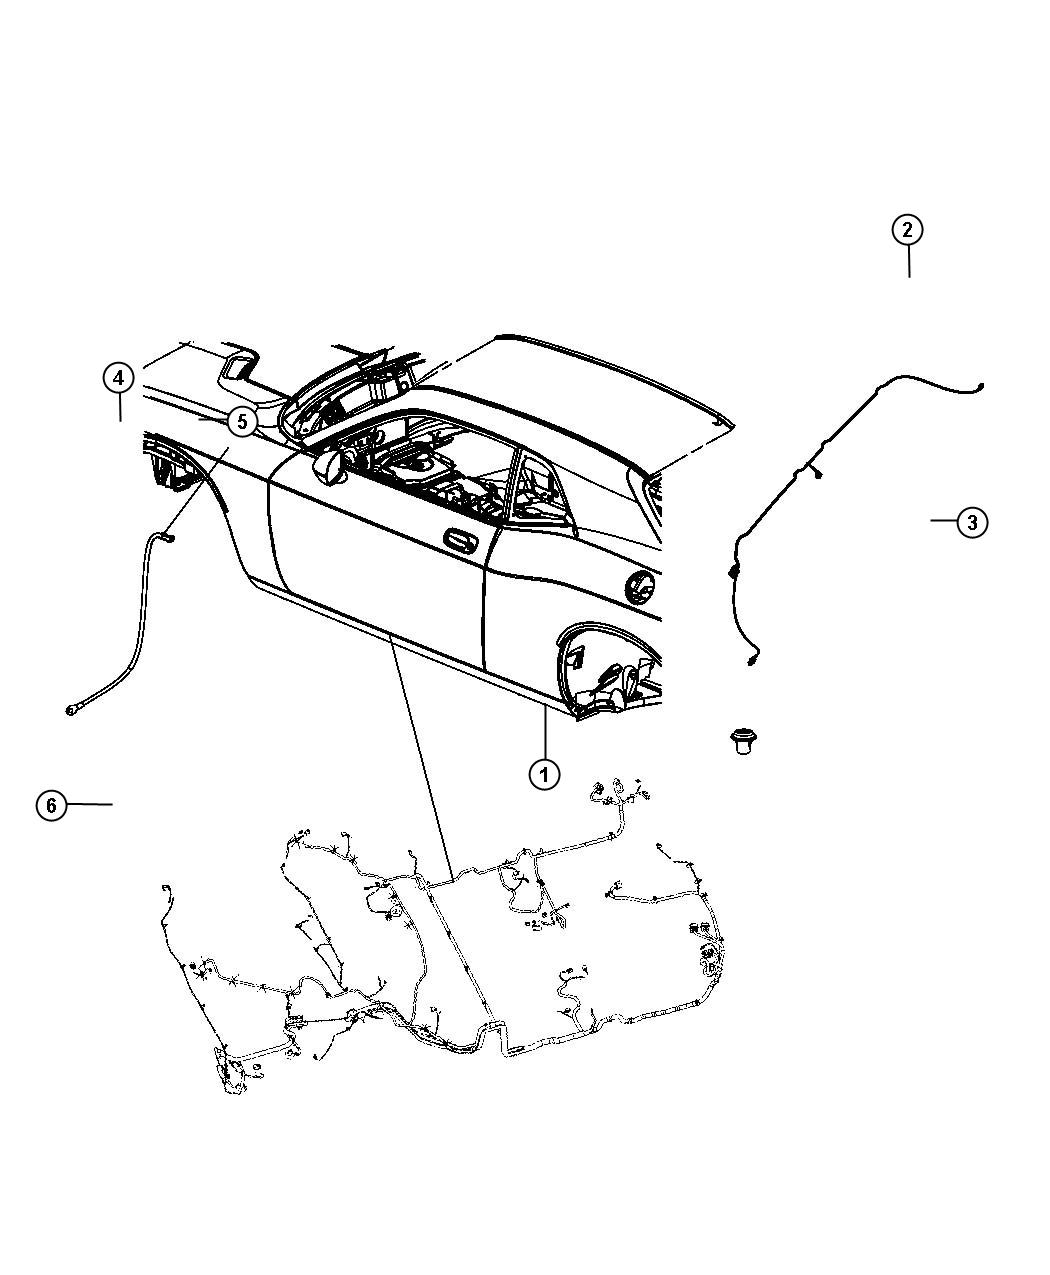 2012 Dodge Challenger Wiring. Rear fascia. Park, assist